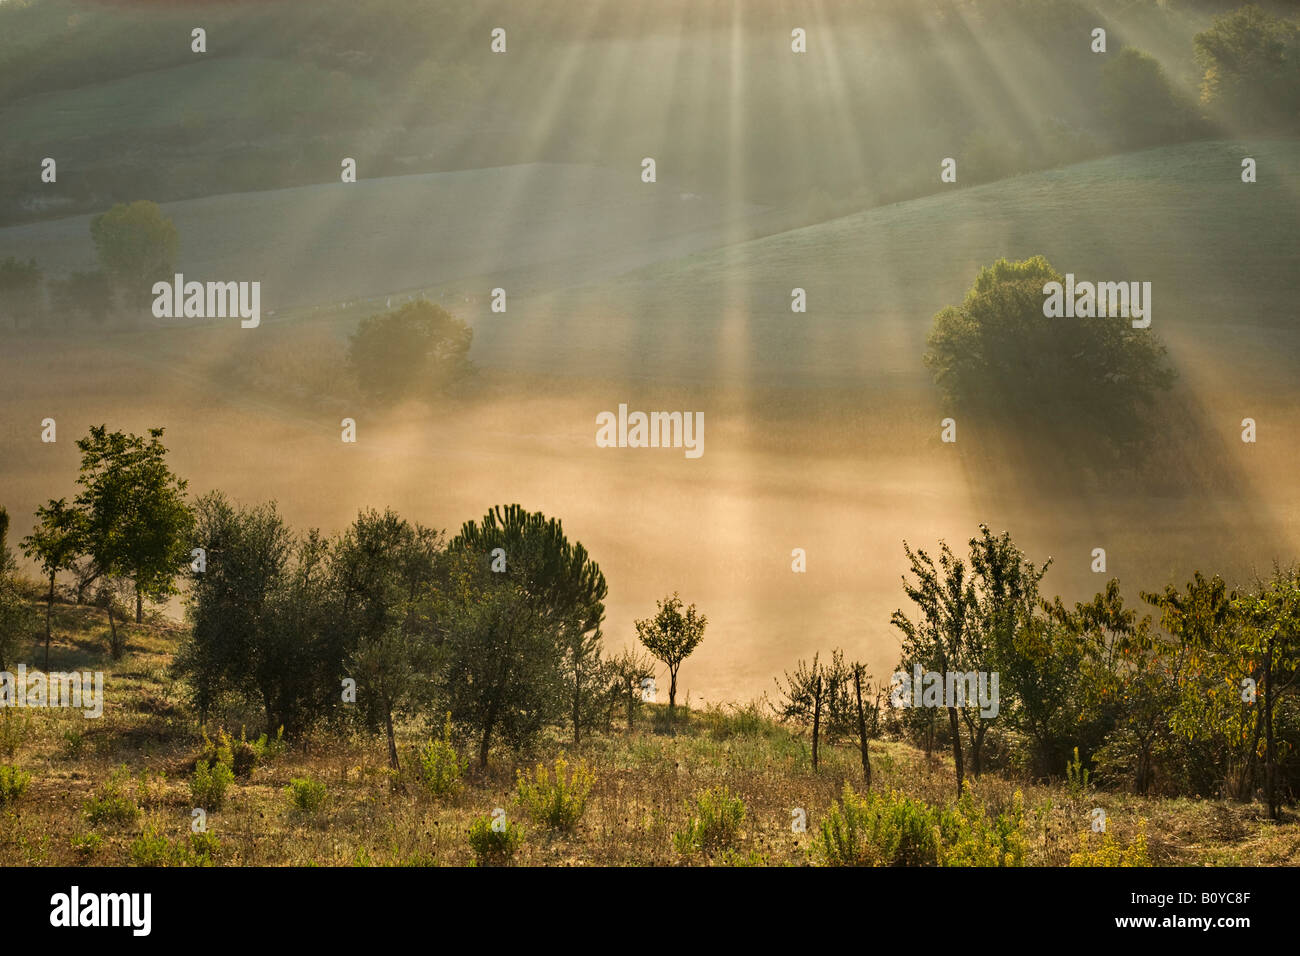 Italie, Toscane, oliviers dans la brume du matin Photo Stock